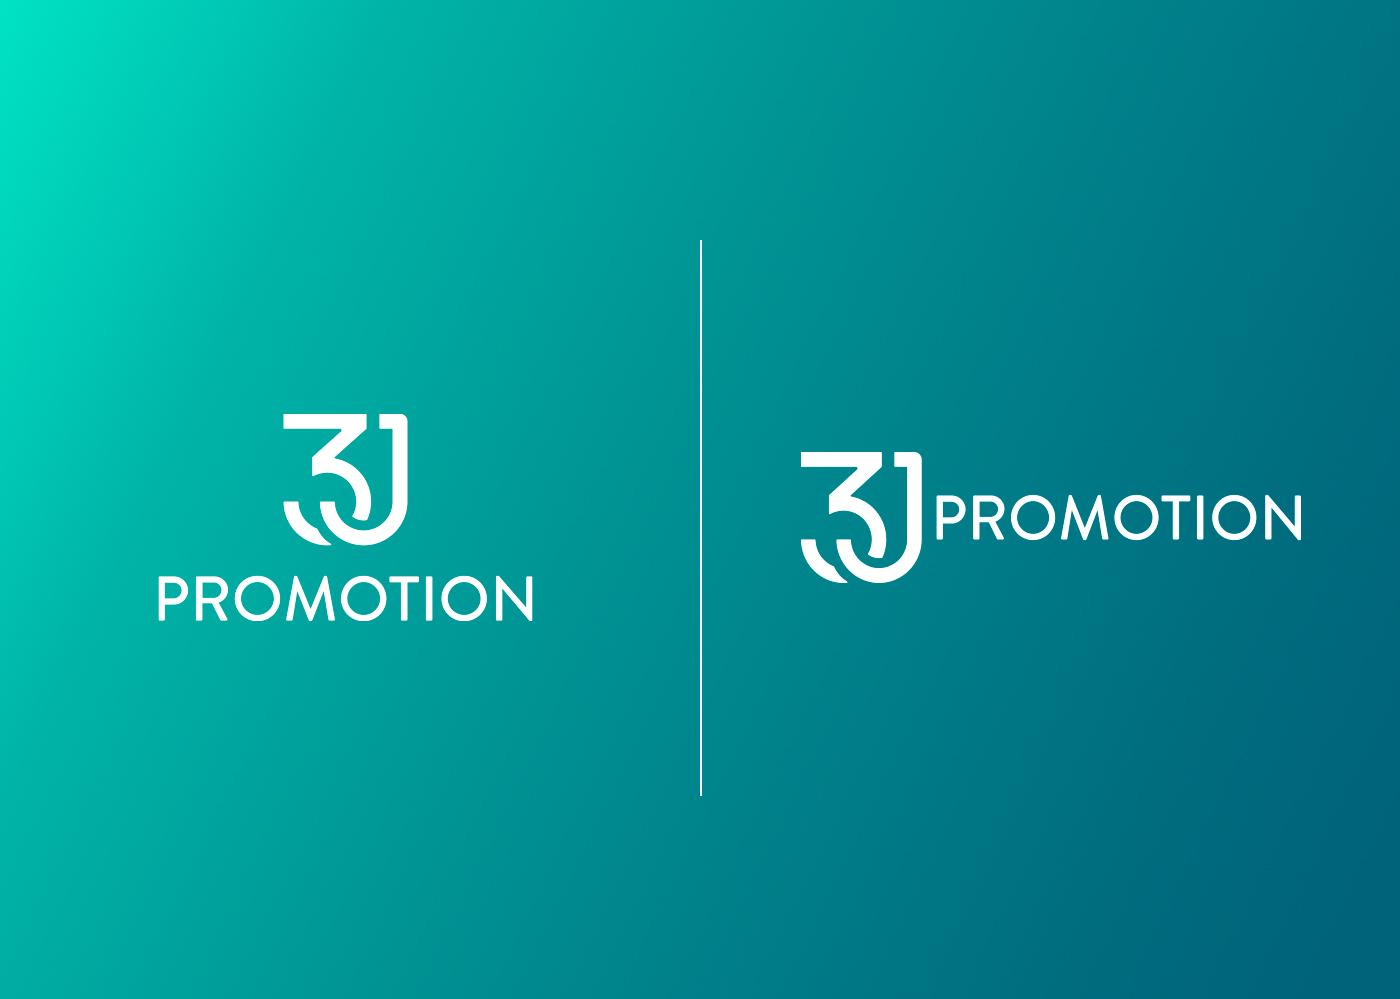 3J immobilier logo alternatives - mathieu Dupuis Freelance